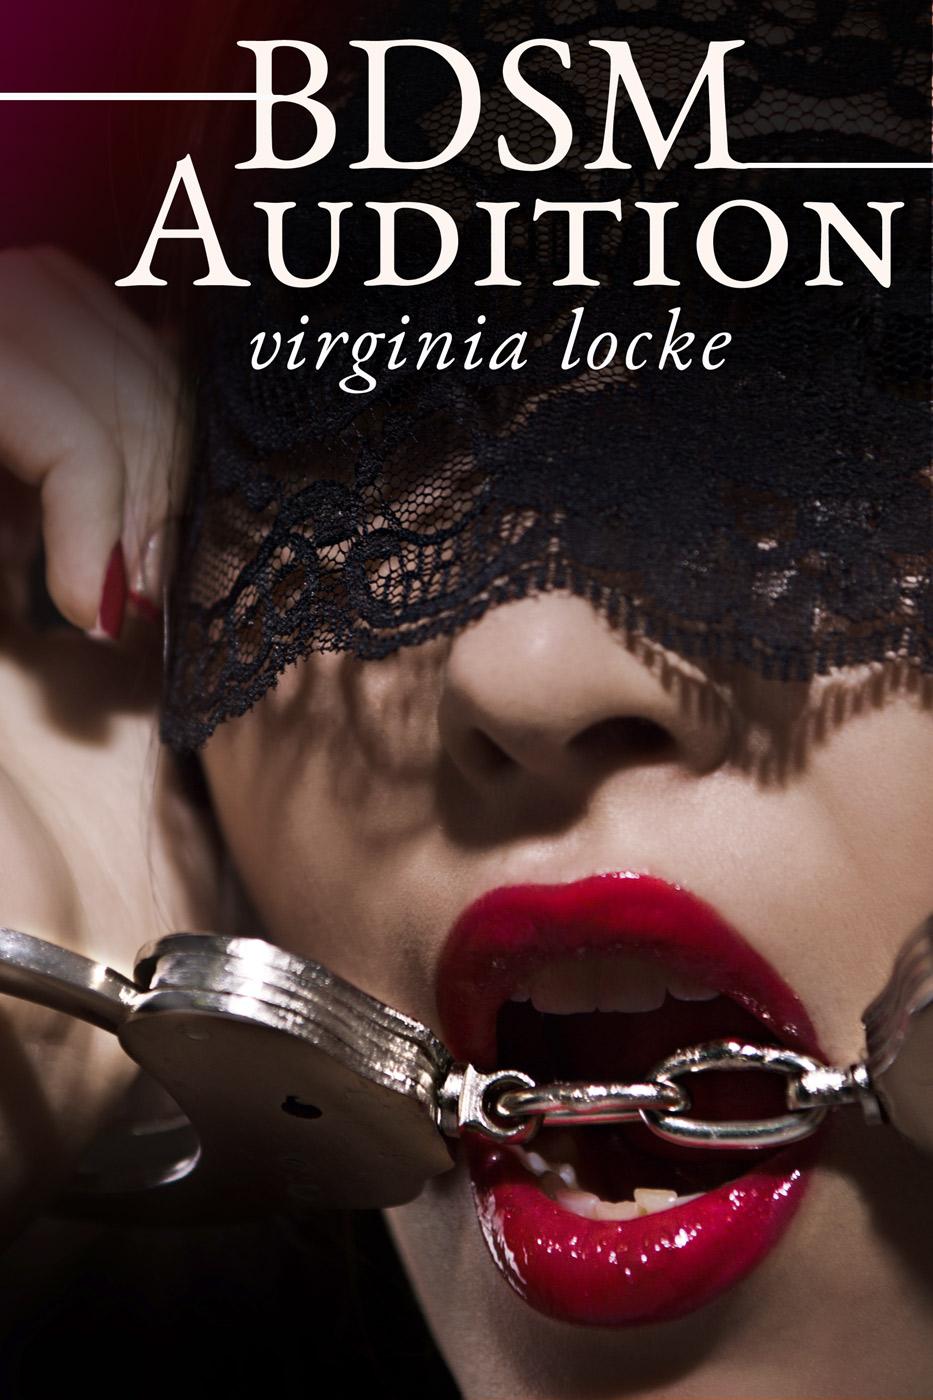 Bdsm audition (erotica)